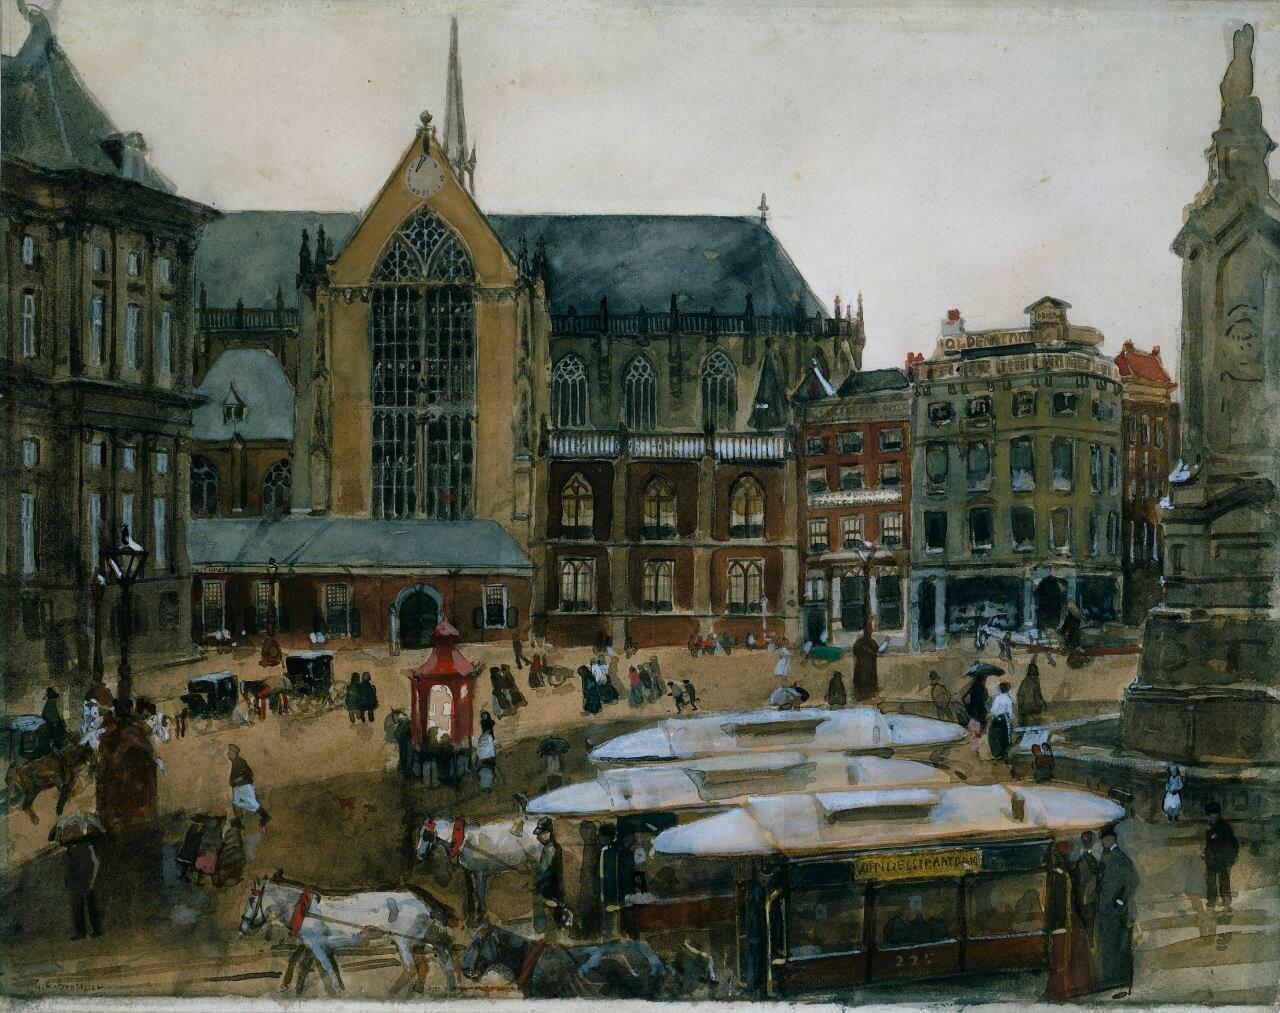 Площадь Дам(название по-голландски) Амстердаме (1895-98)_ Георг Хендрик Брейтнер (1857–1923);